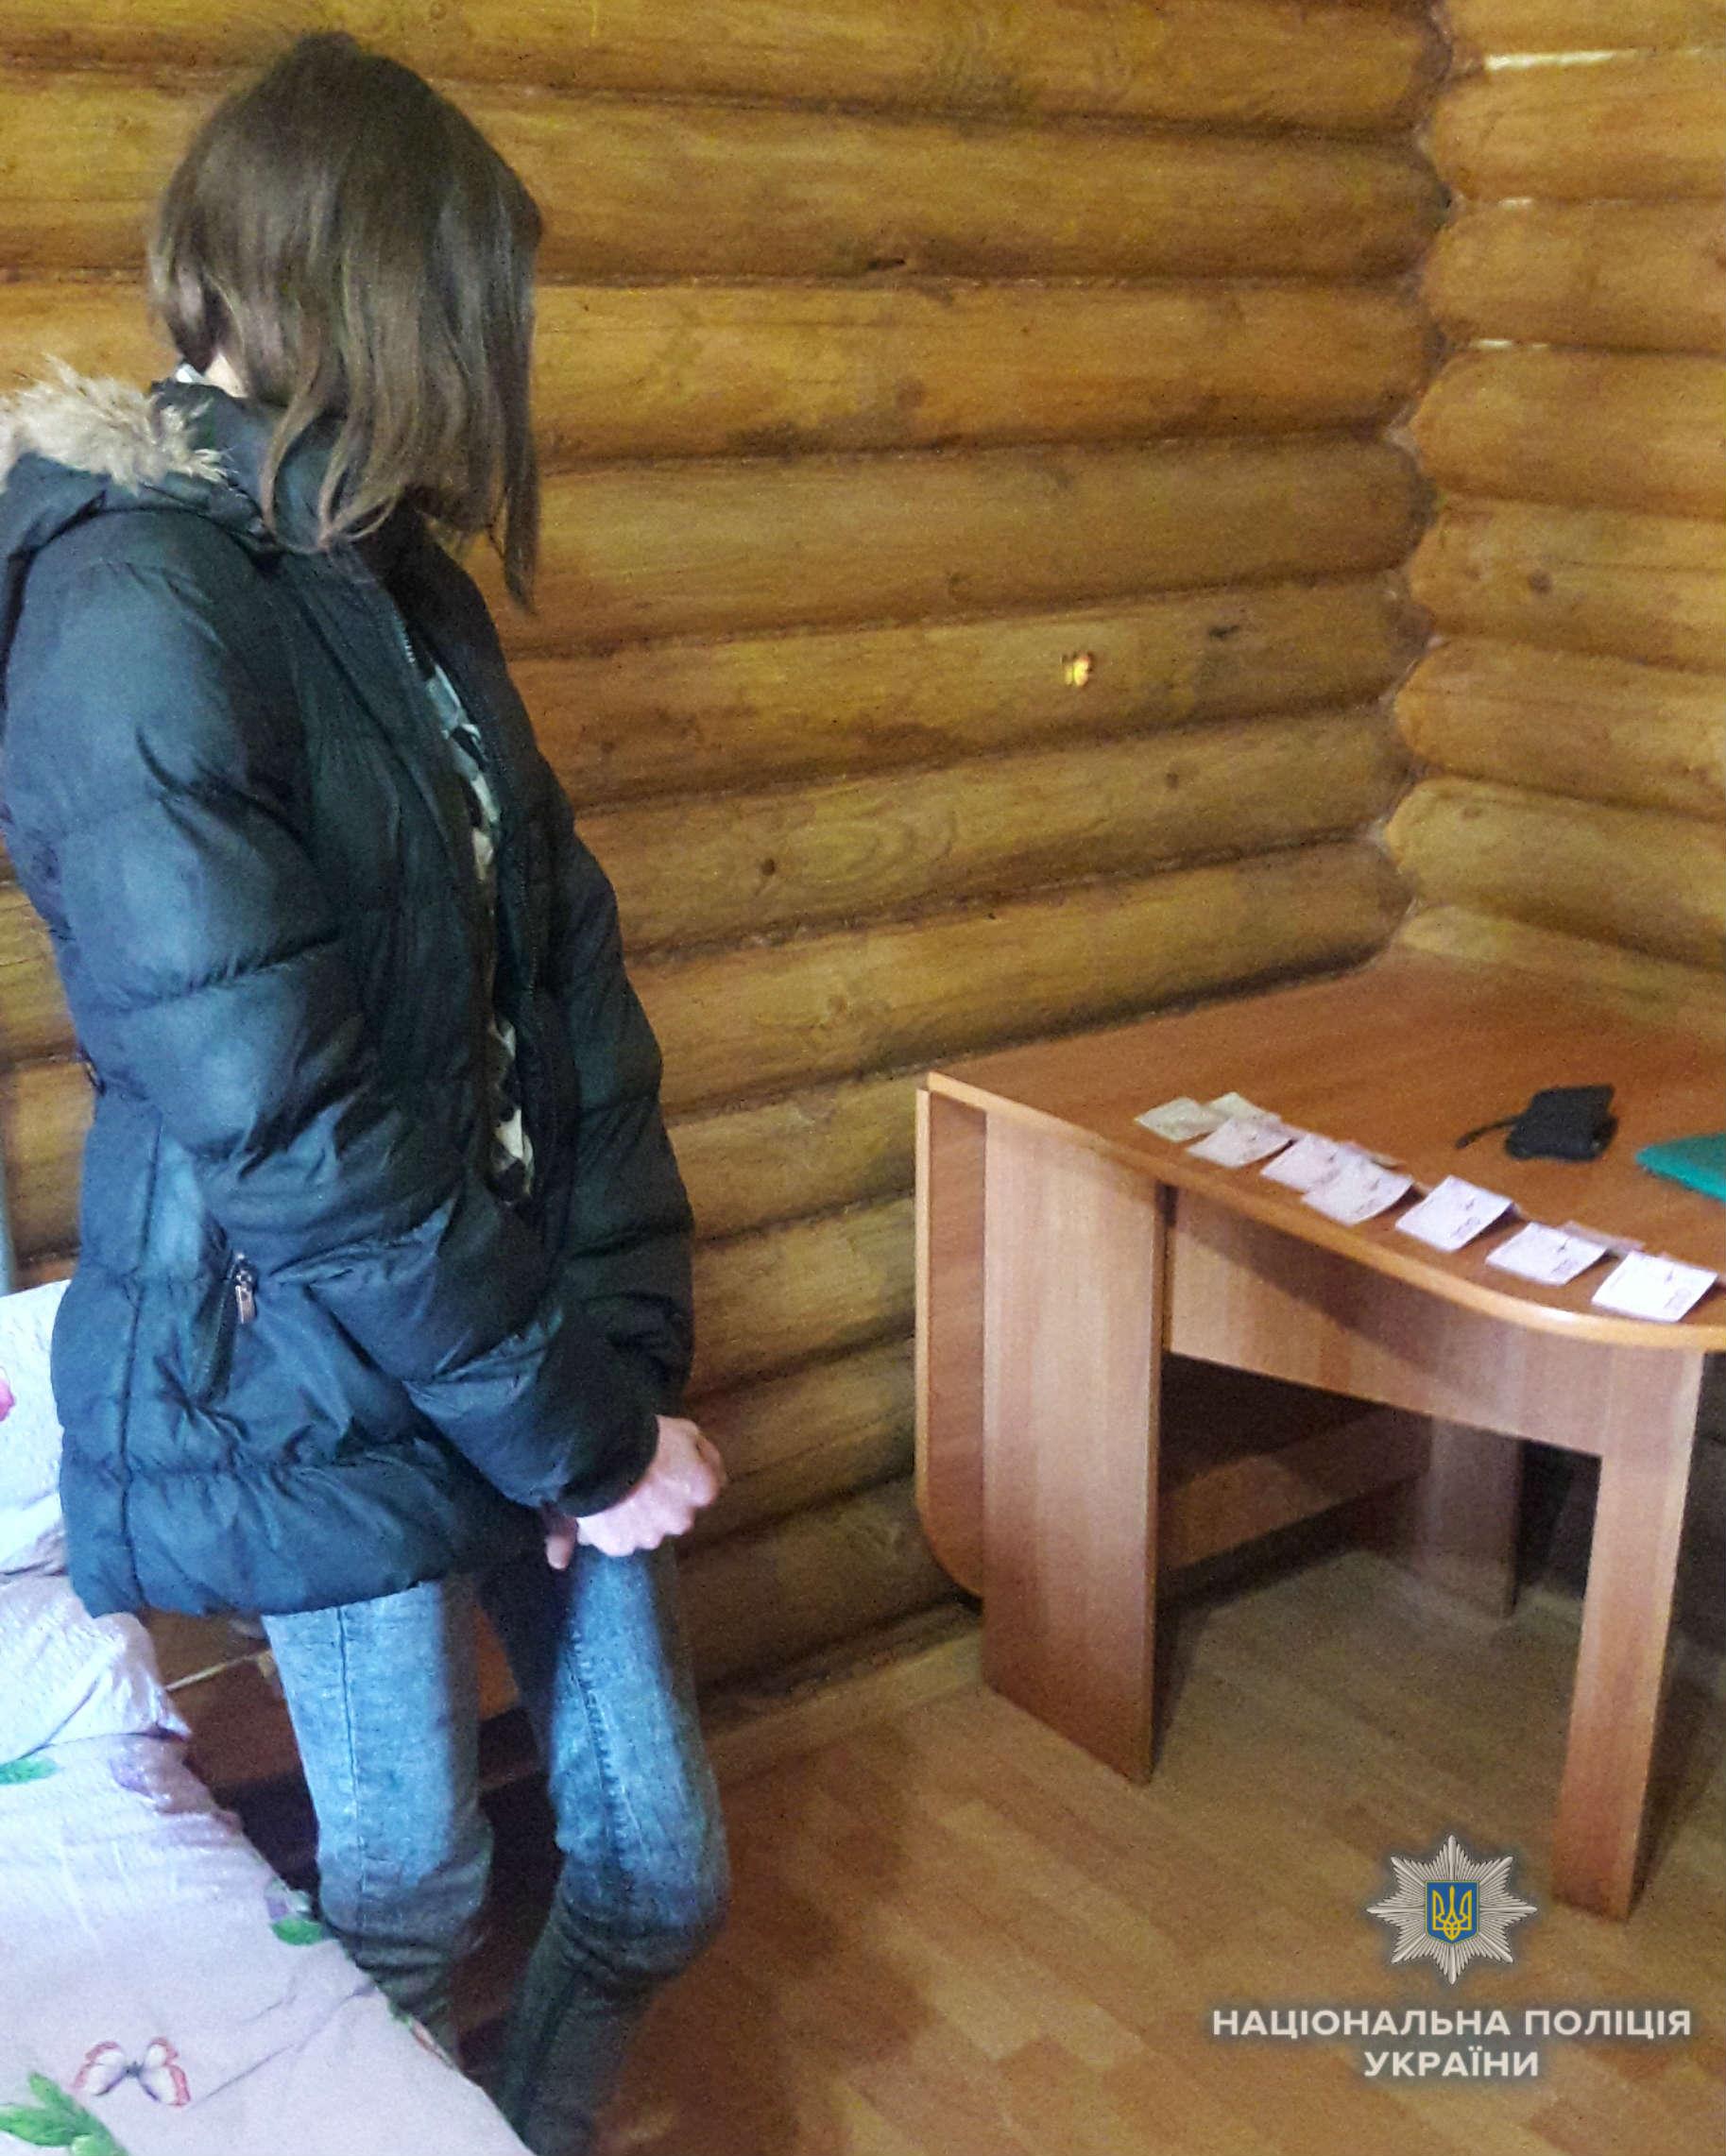 Поліція Закарпаття задокументувала факт звідництва у Сваляві